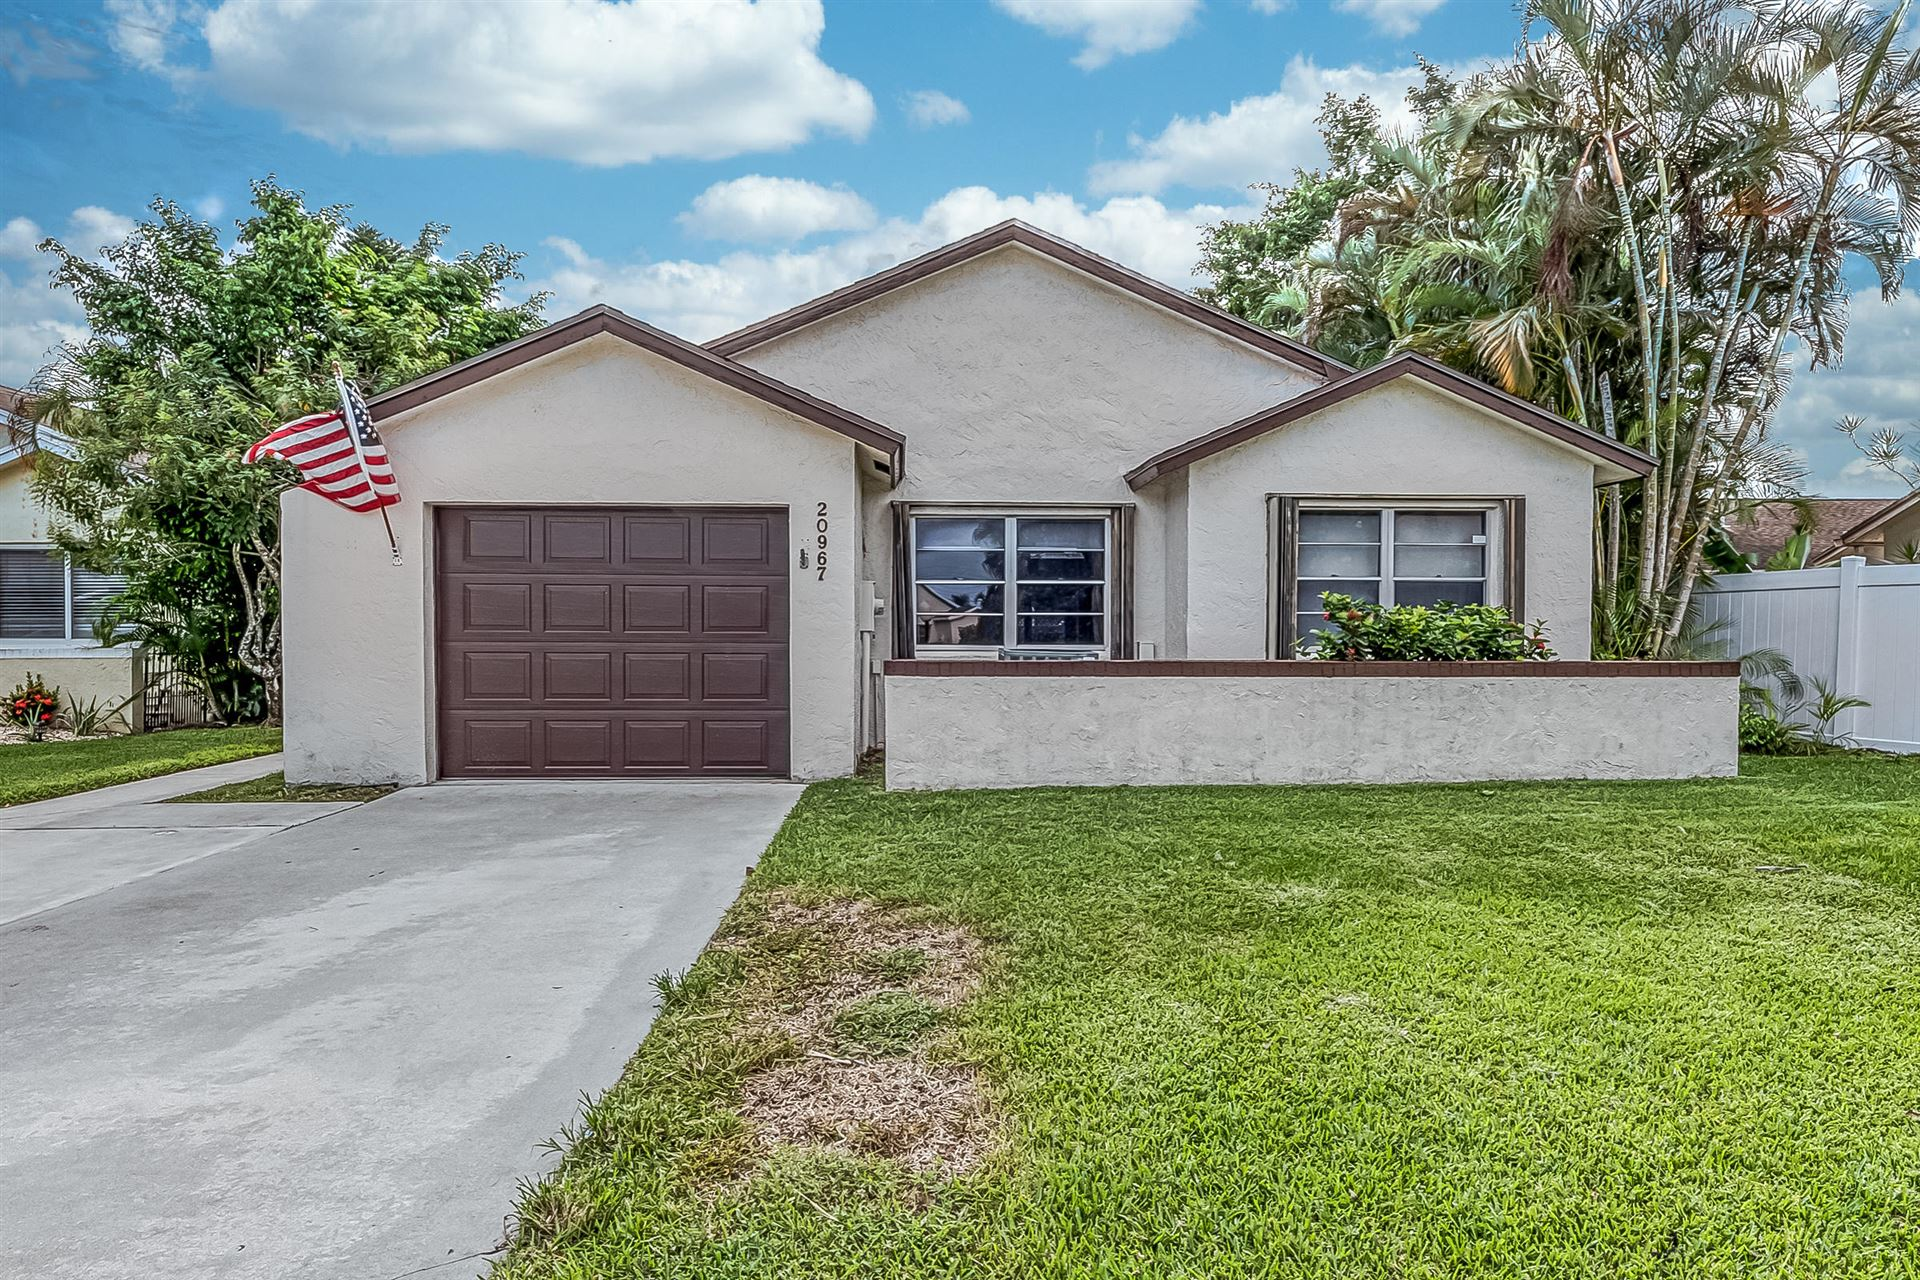 Photo of 20967 Springs Terrace, Boca Raton, FL 33428 (MLS # RX-10657916)